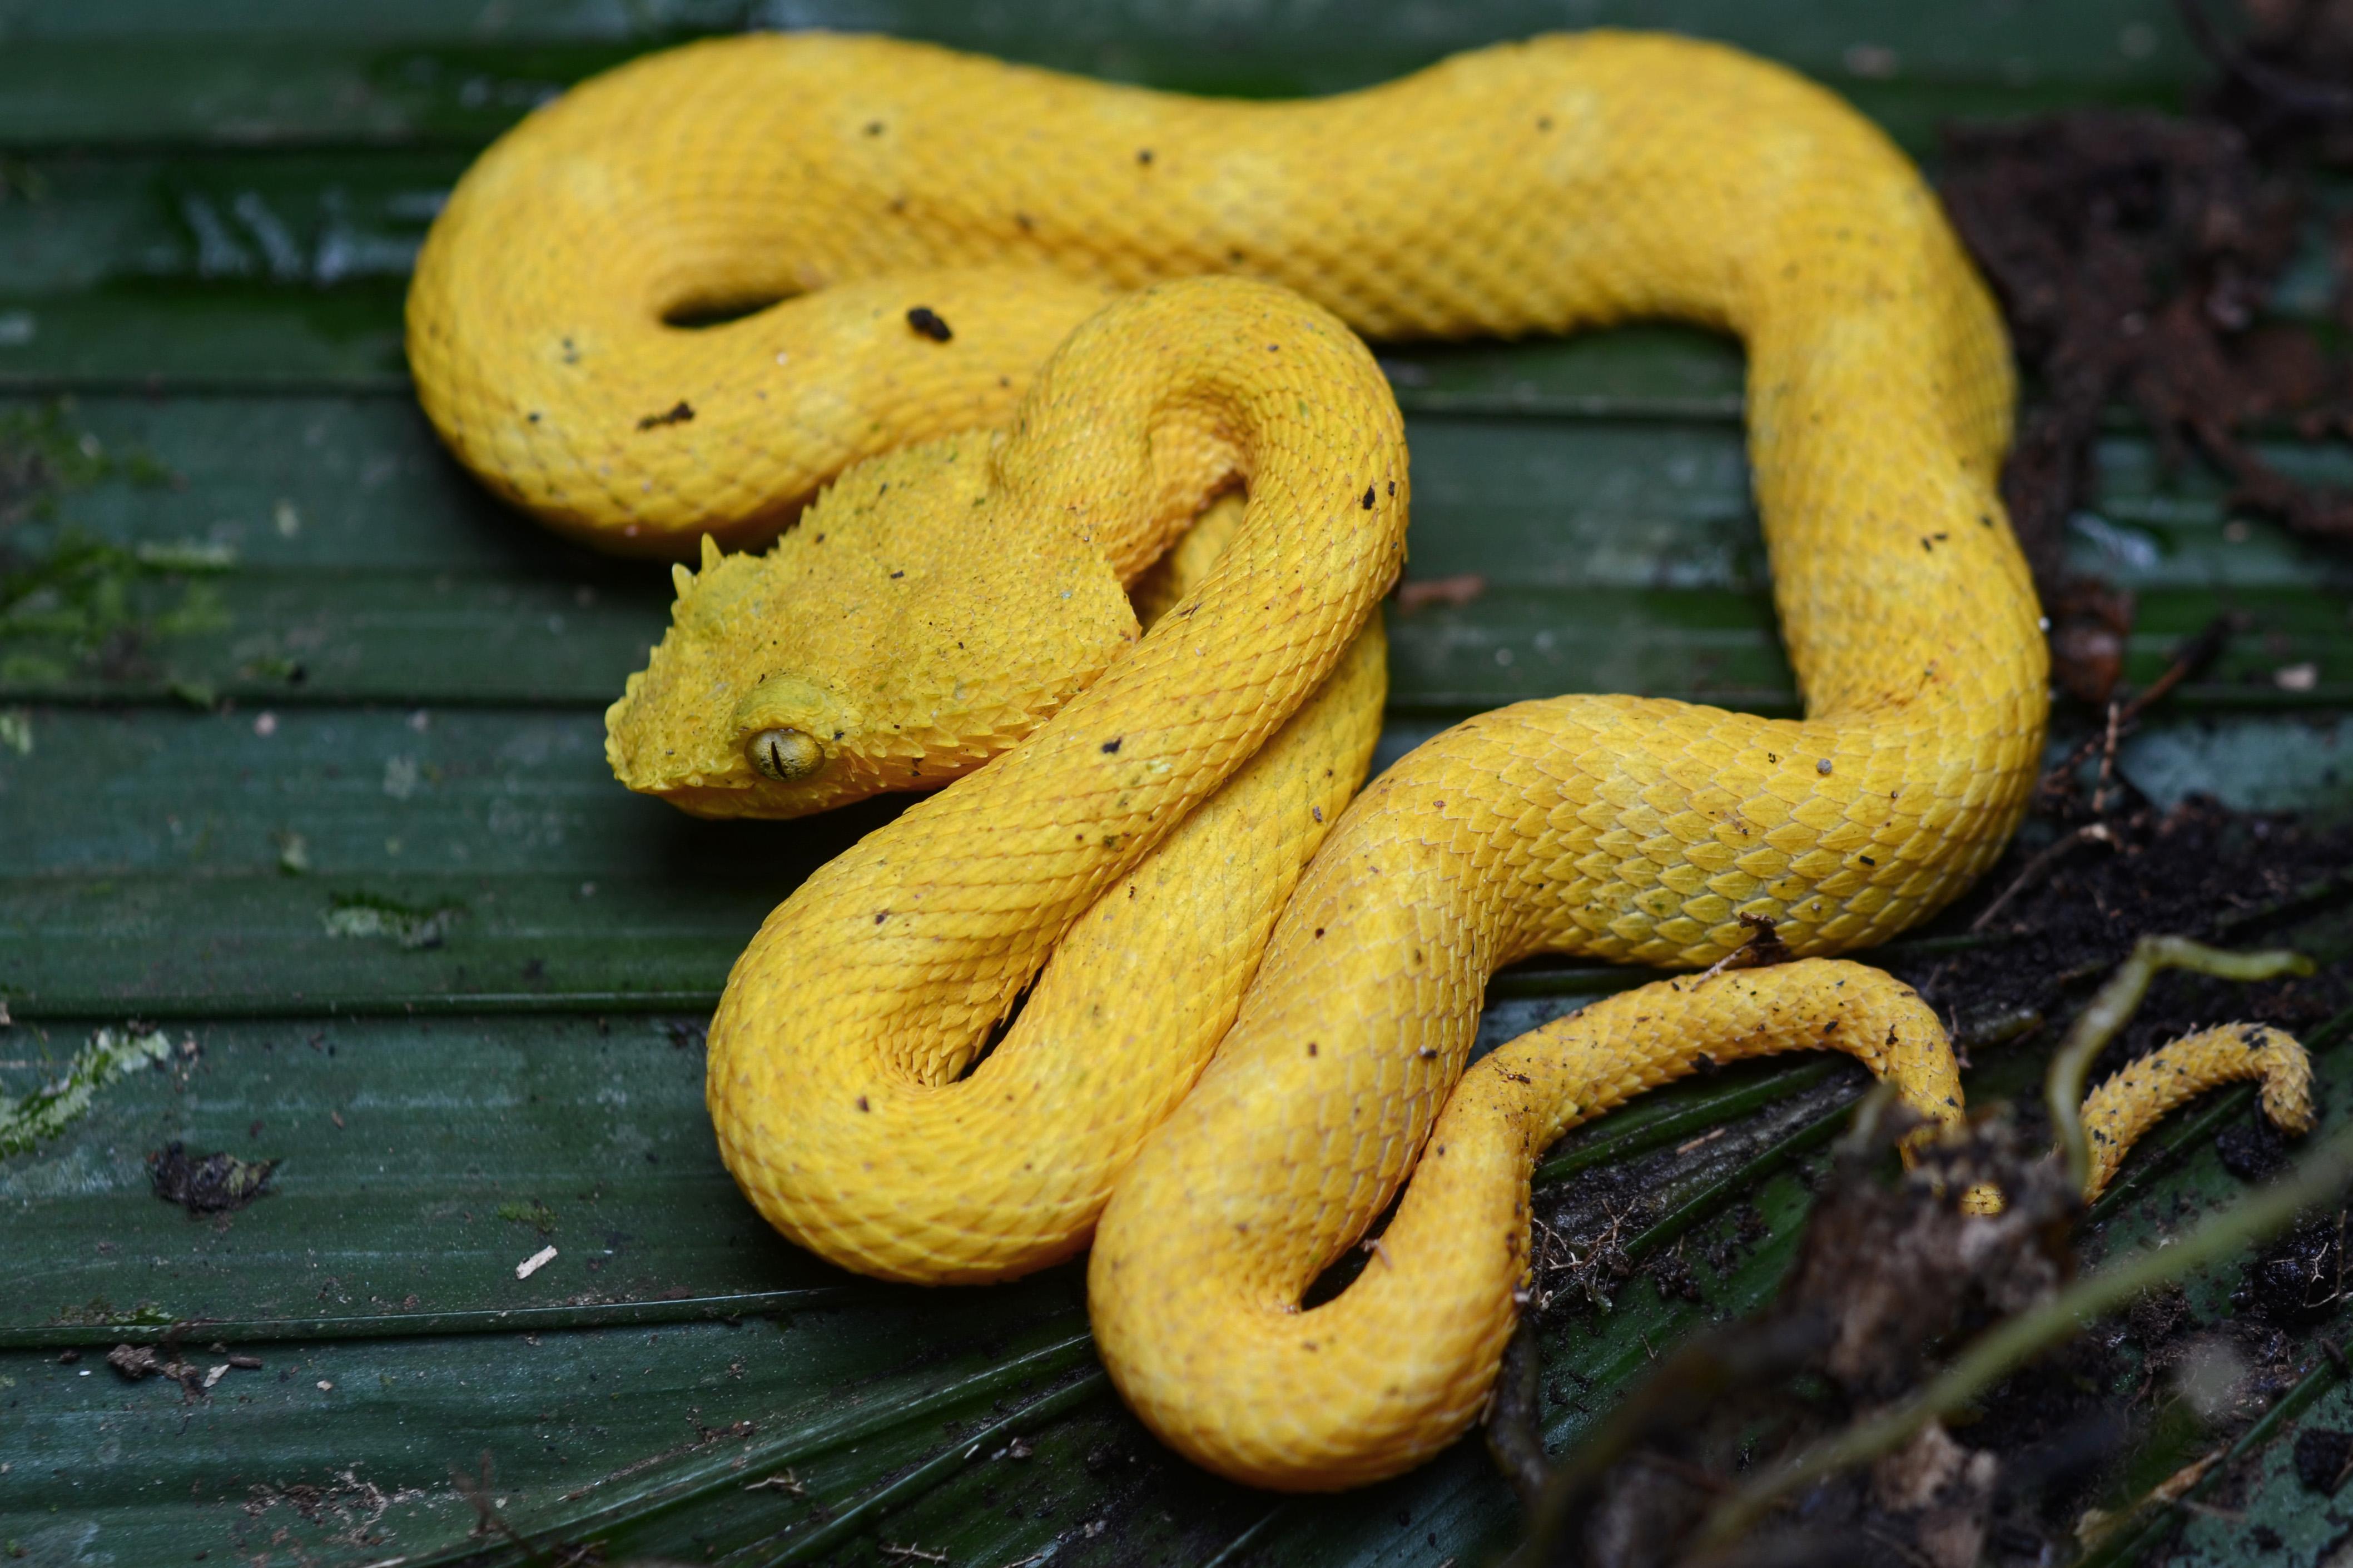 File:Flickr - ggallice - Eyelash palm-pitviper.jpg - Wikimedia Commons